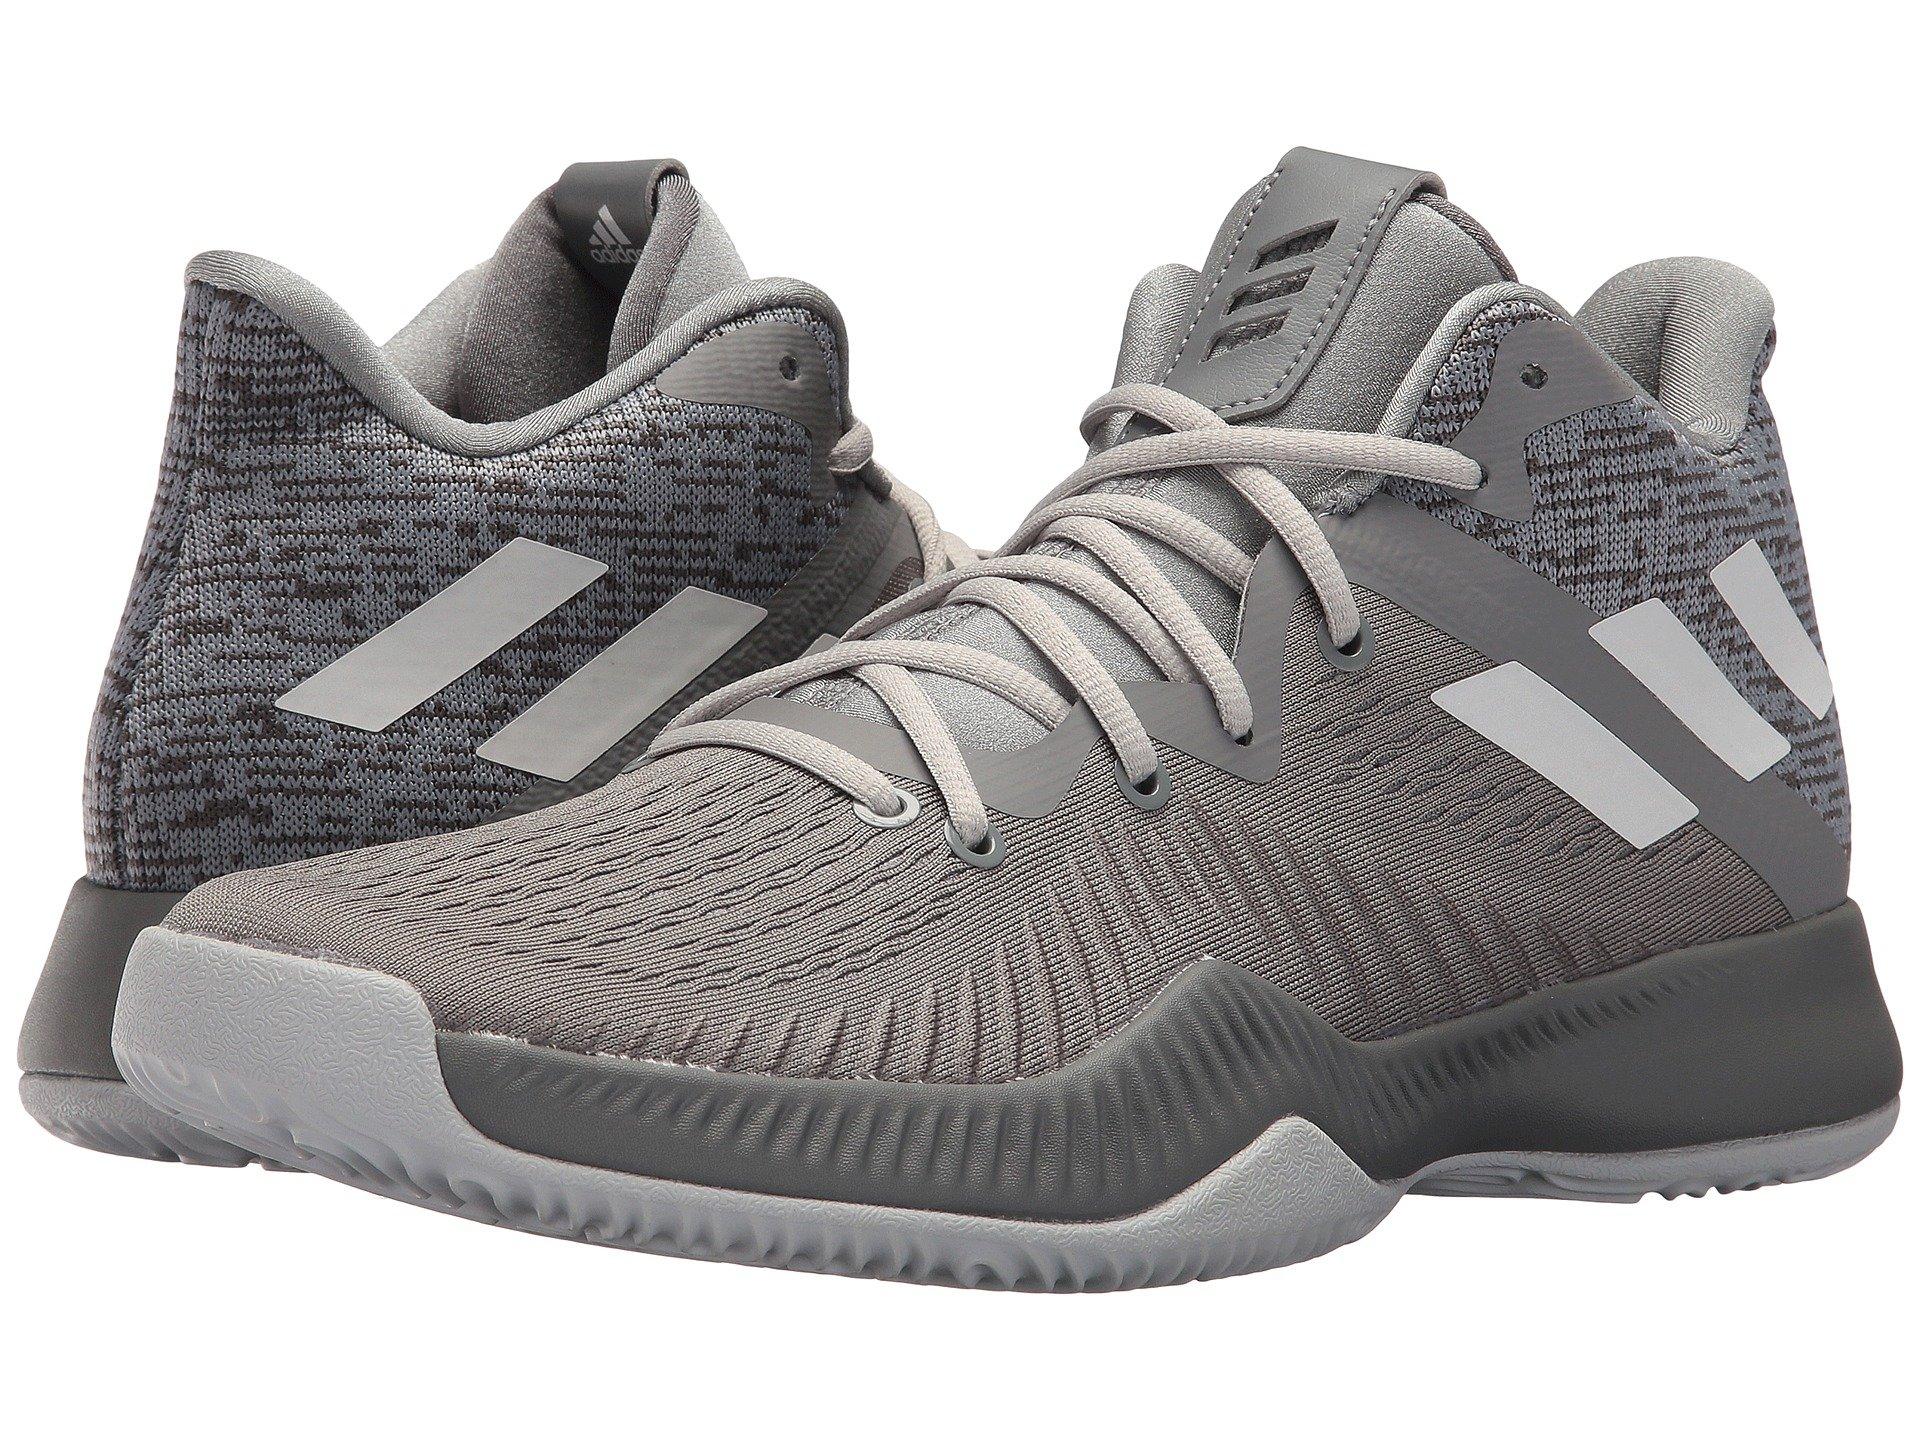 da5f06142 Adidas Originals Mad Bounce In Grey Three White Grey Four ...